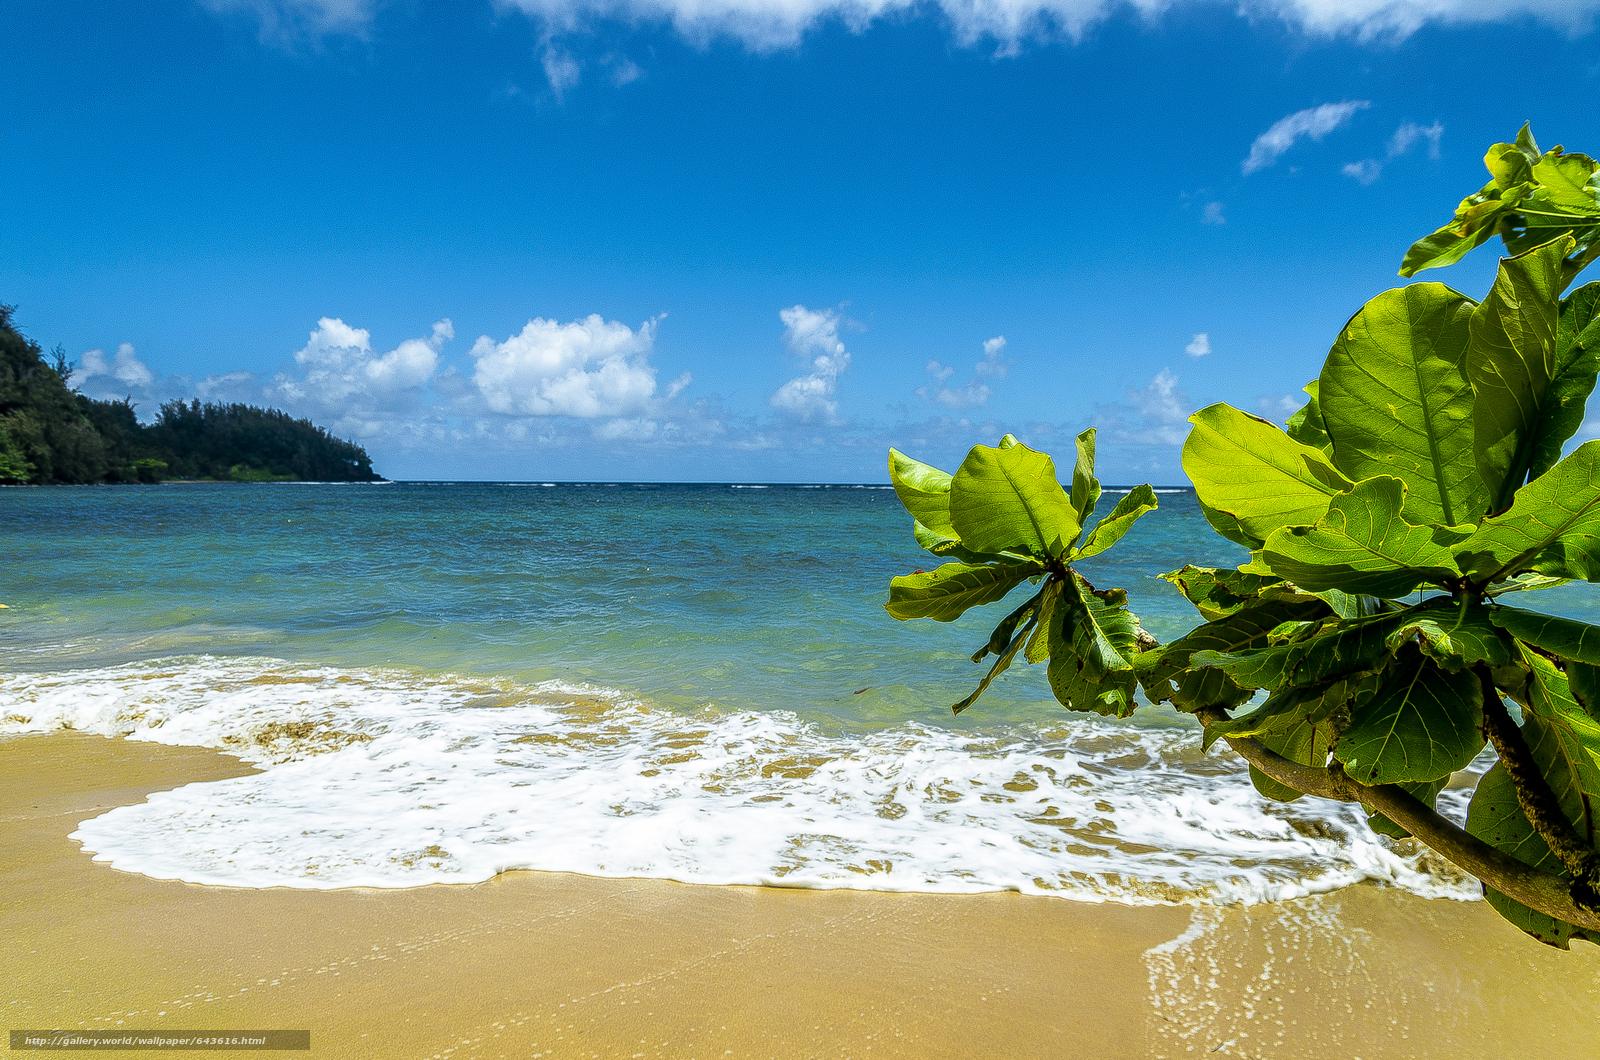 Download wallpaper Kauai Island,  Hawaiian Islands,  sea,  shore free desktop wallpaper in the resolution 4928x3264 — picture №643616